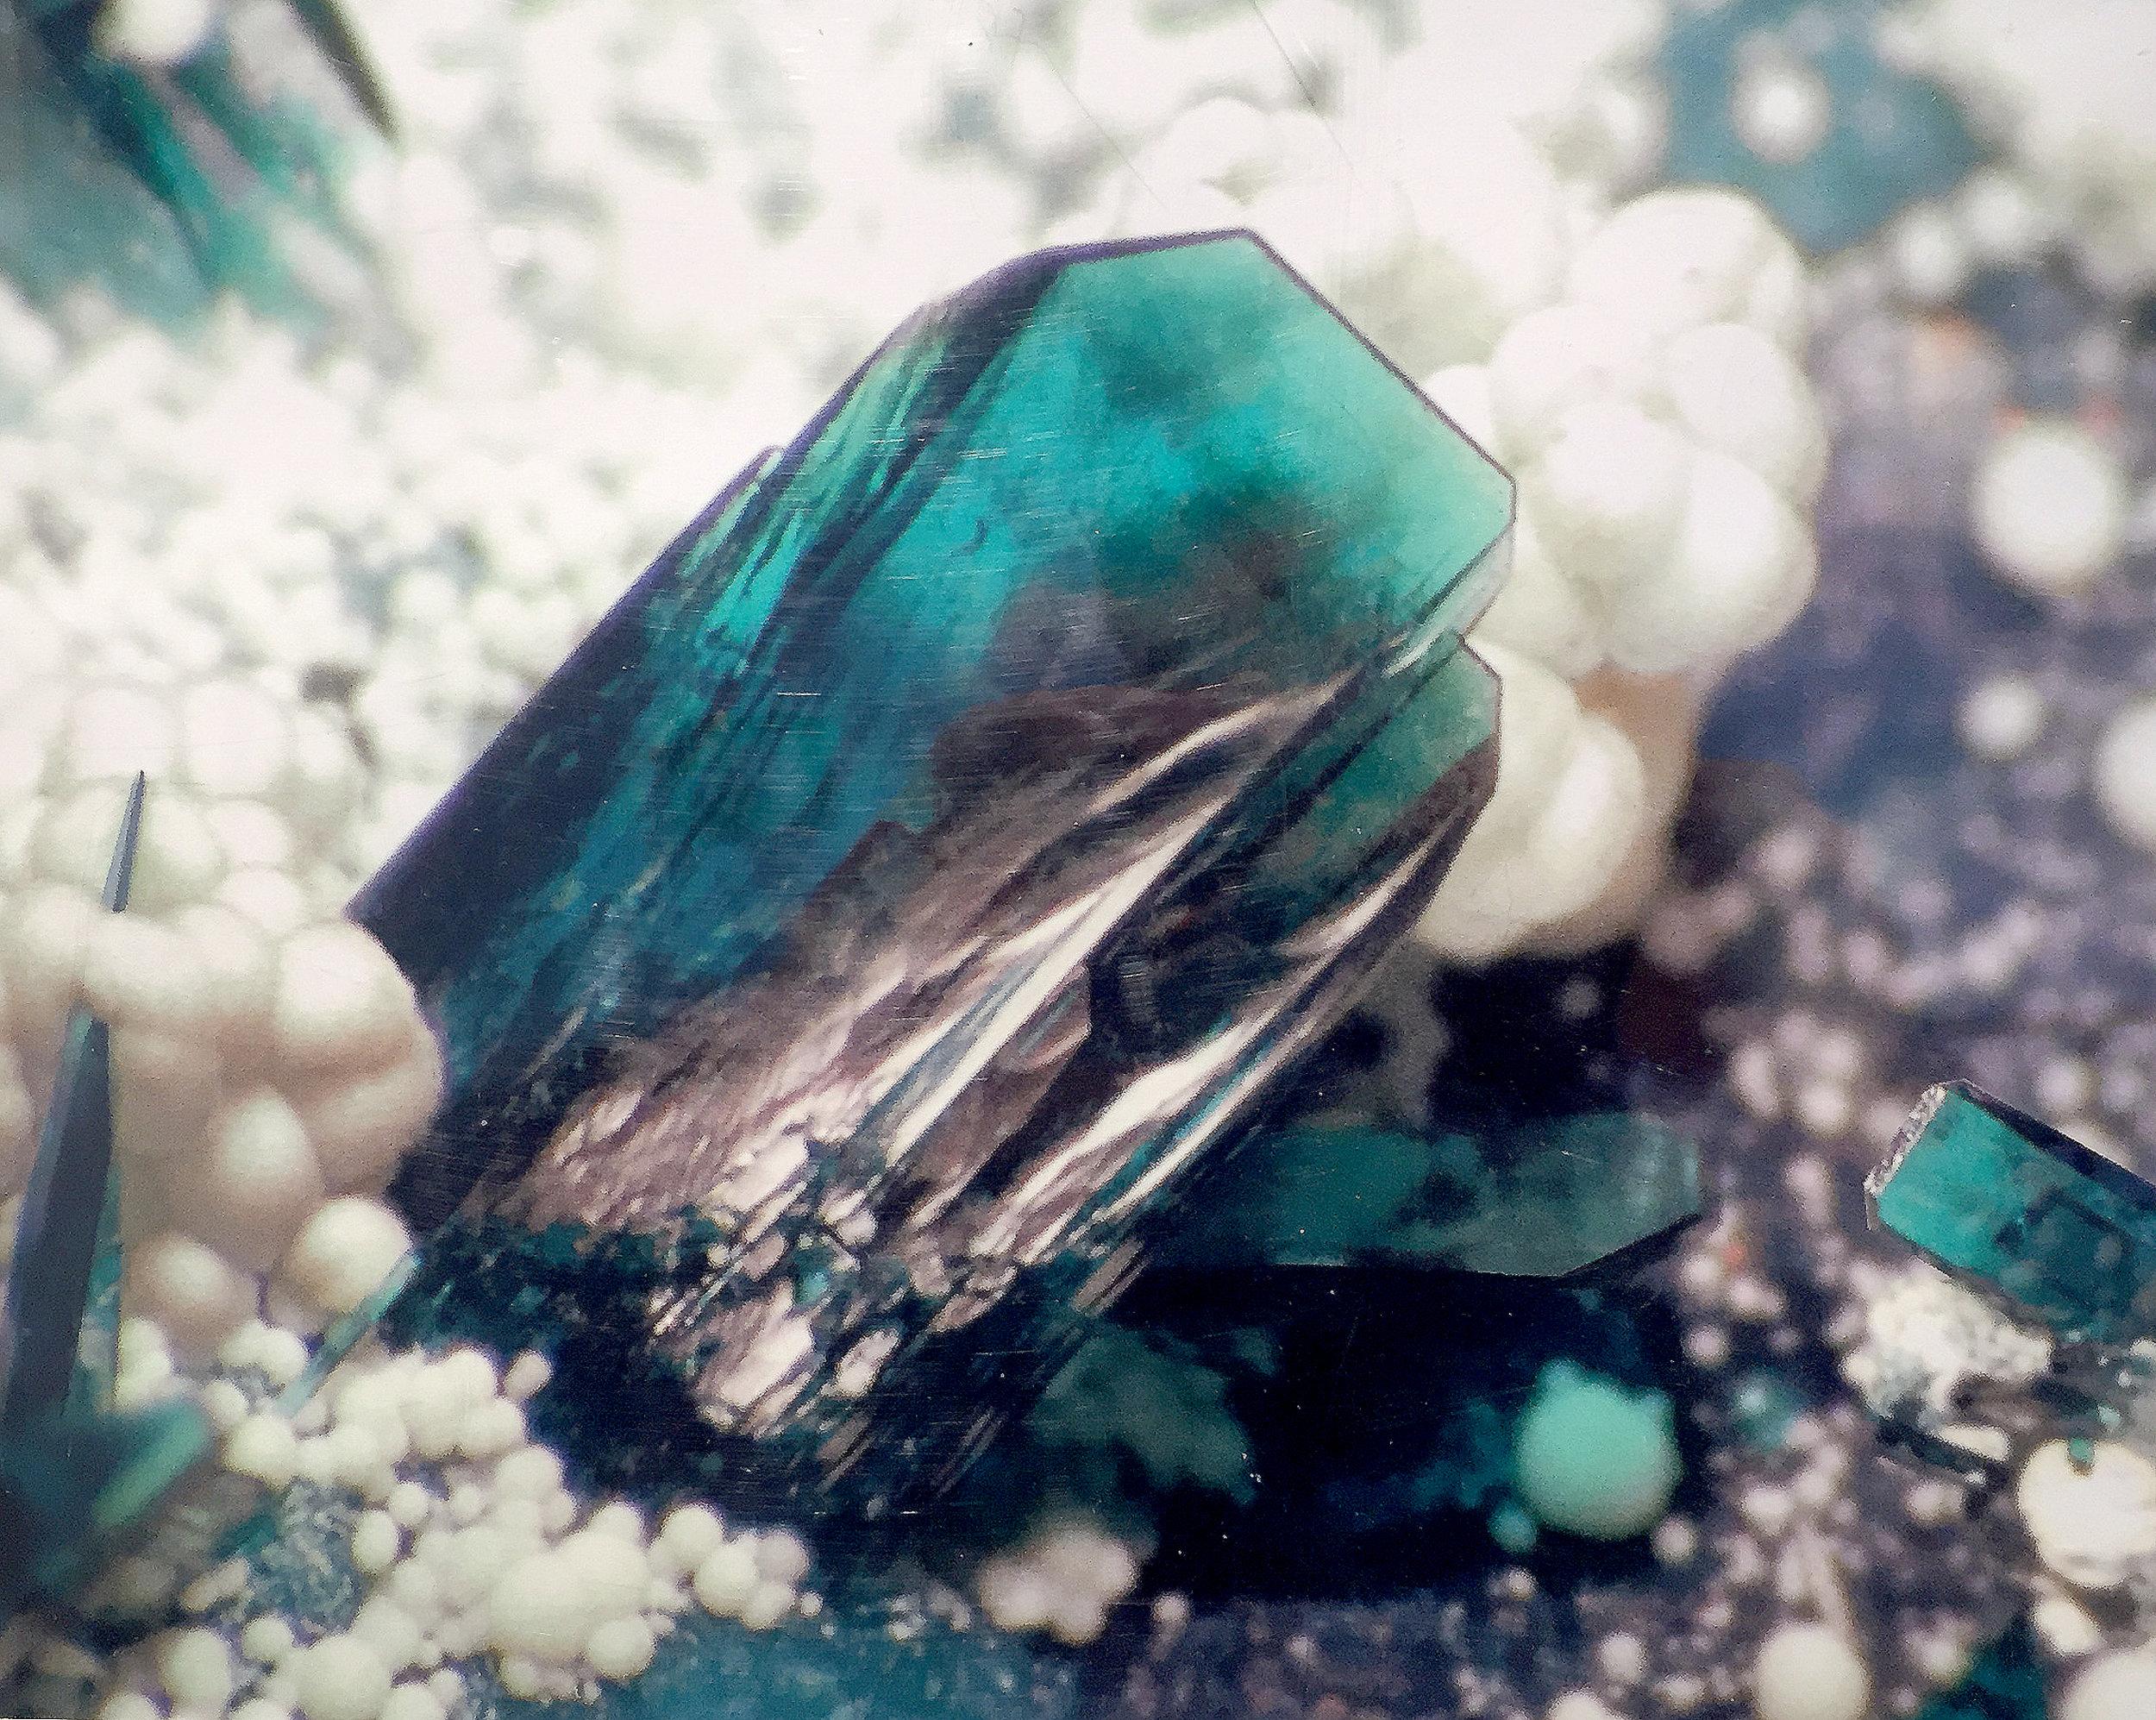 Copiapo, Chile Micro Crystal Saul Krotki.JPG